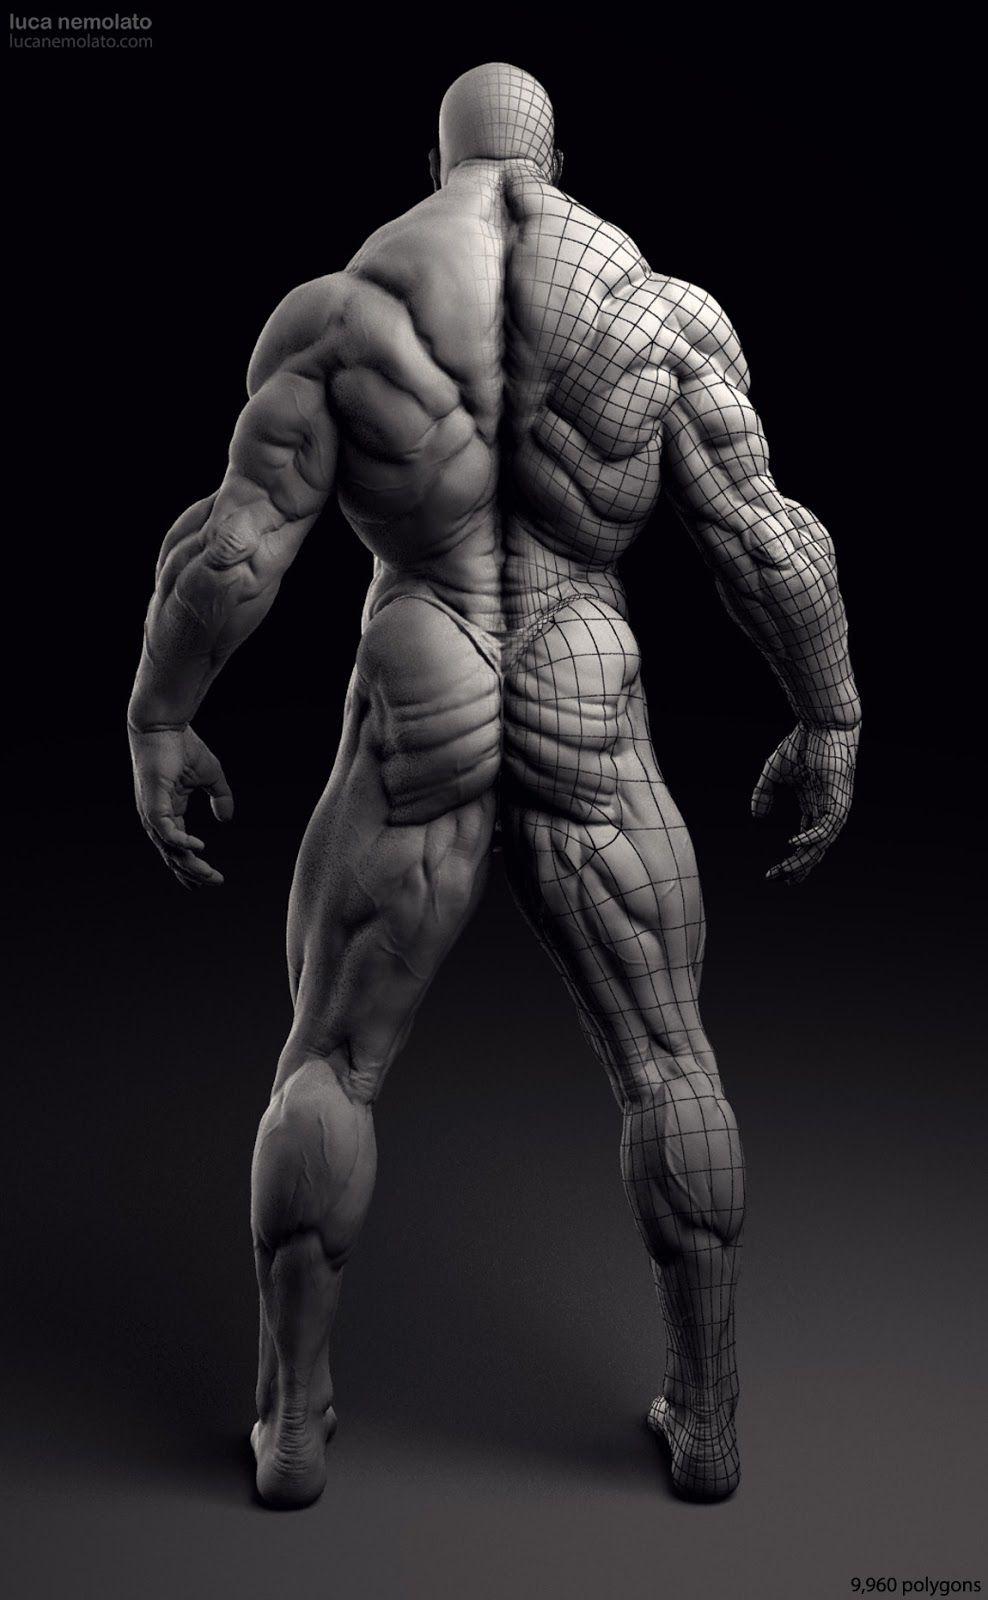 Extreme Bodybuilder - vray renders via cgpin.com | 3D | Pinterest ...